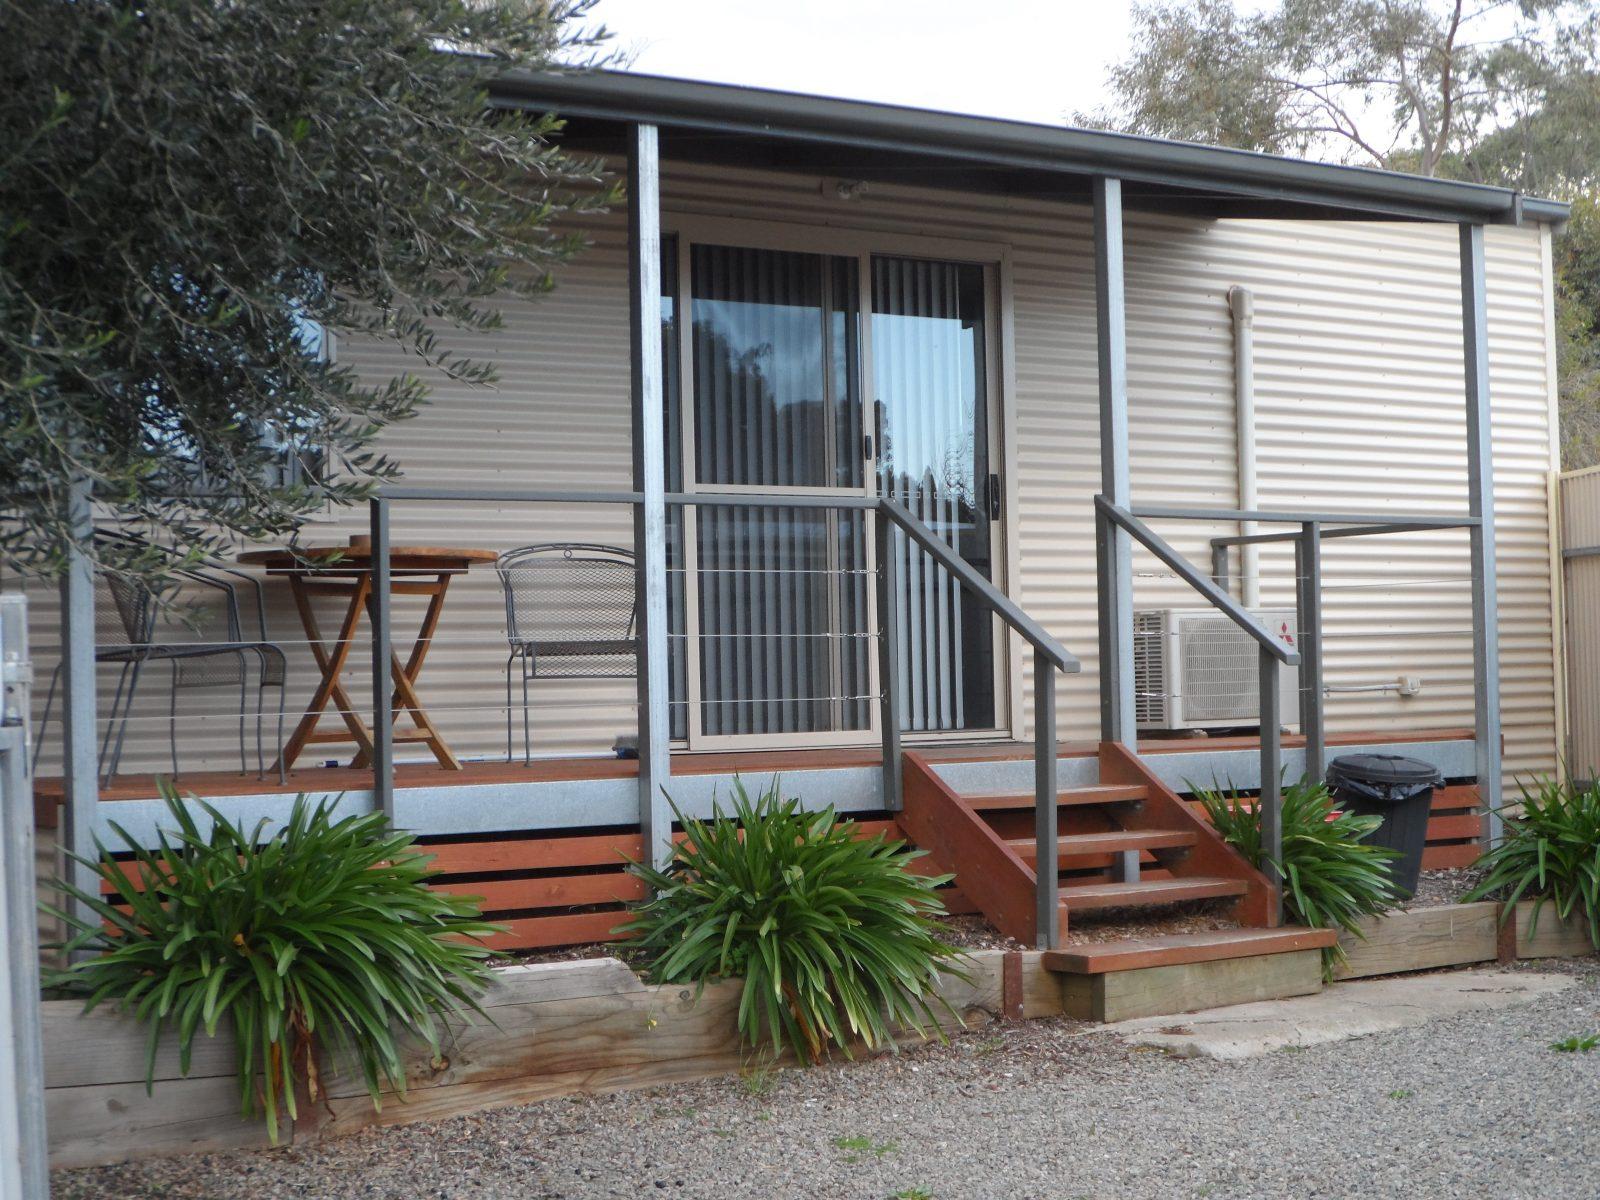 Cabin 8 - Leasingham Village Cabins